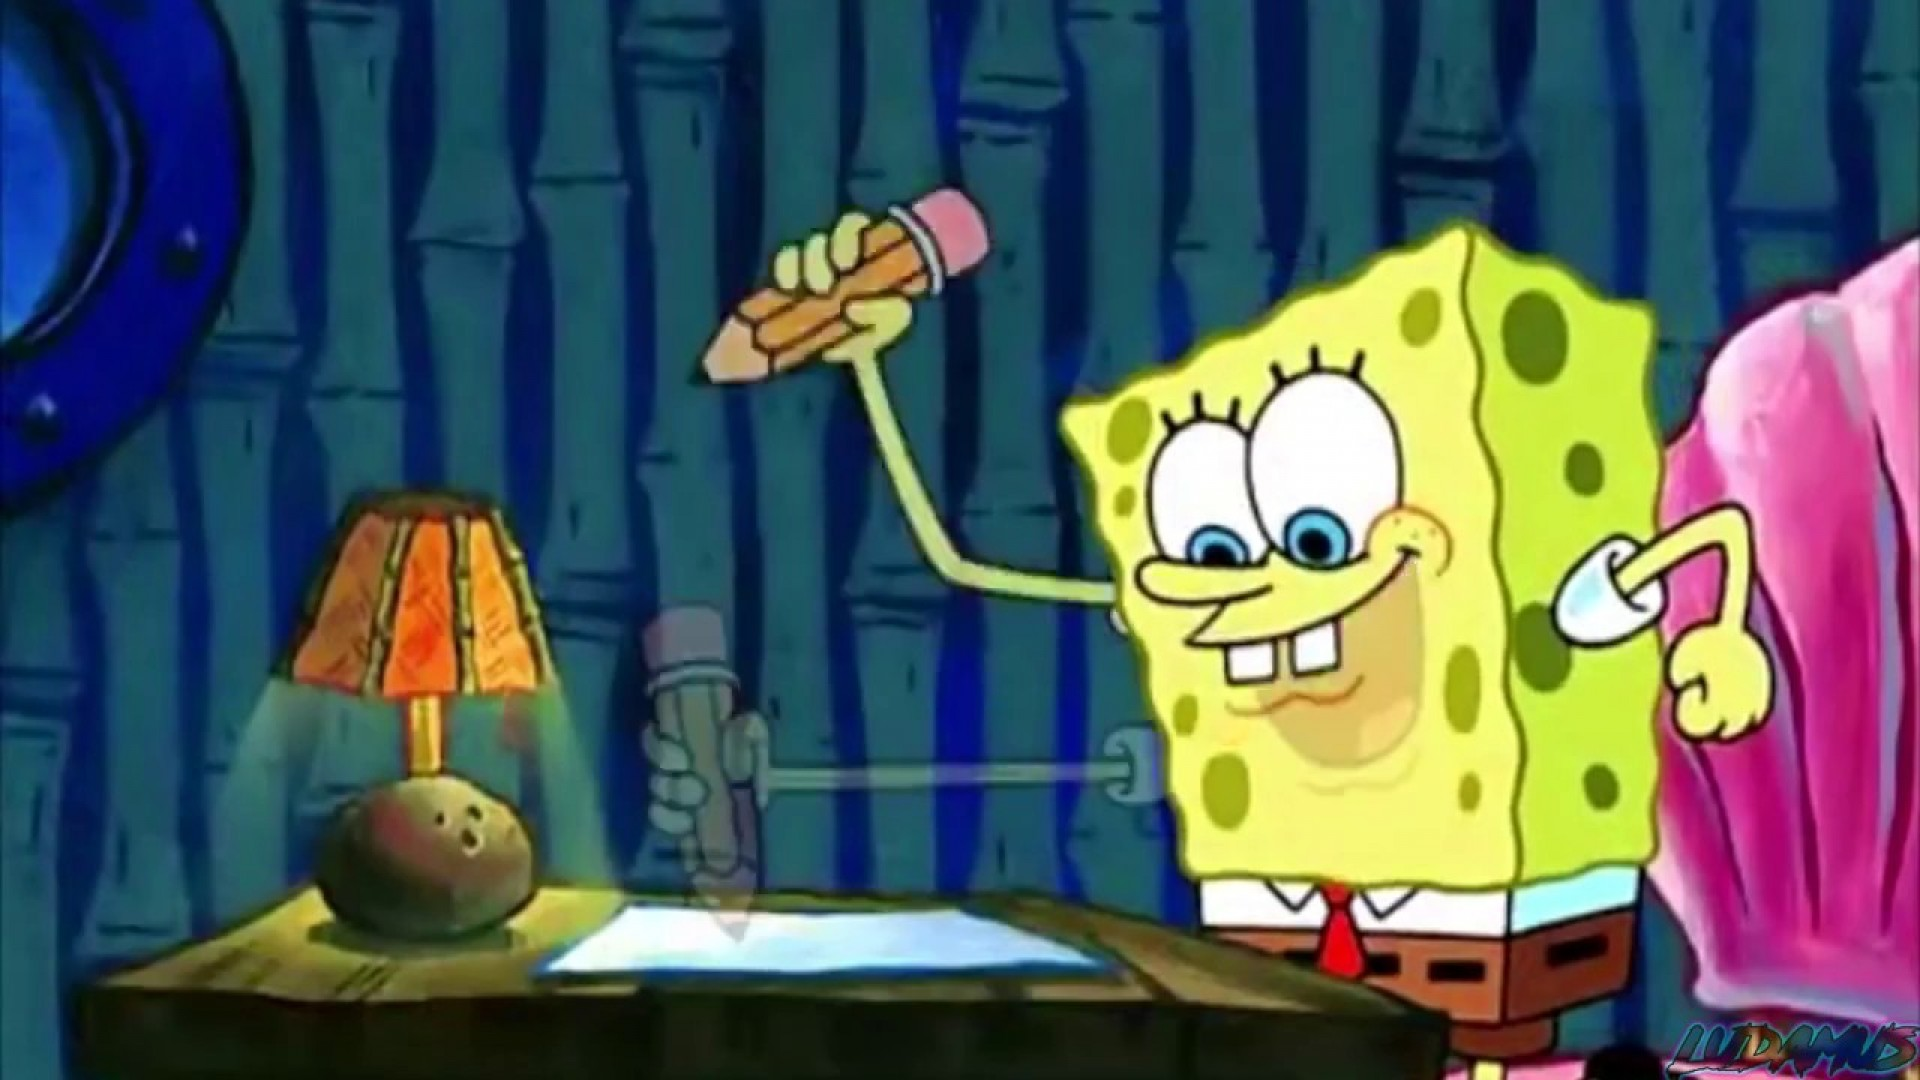 015 Essay Example Spongebob Meme Writing His Term Paper Help Bkhomeworkqvci Dedup Info Maxresde Stirring Generator Font 1920